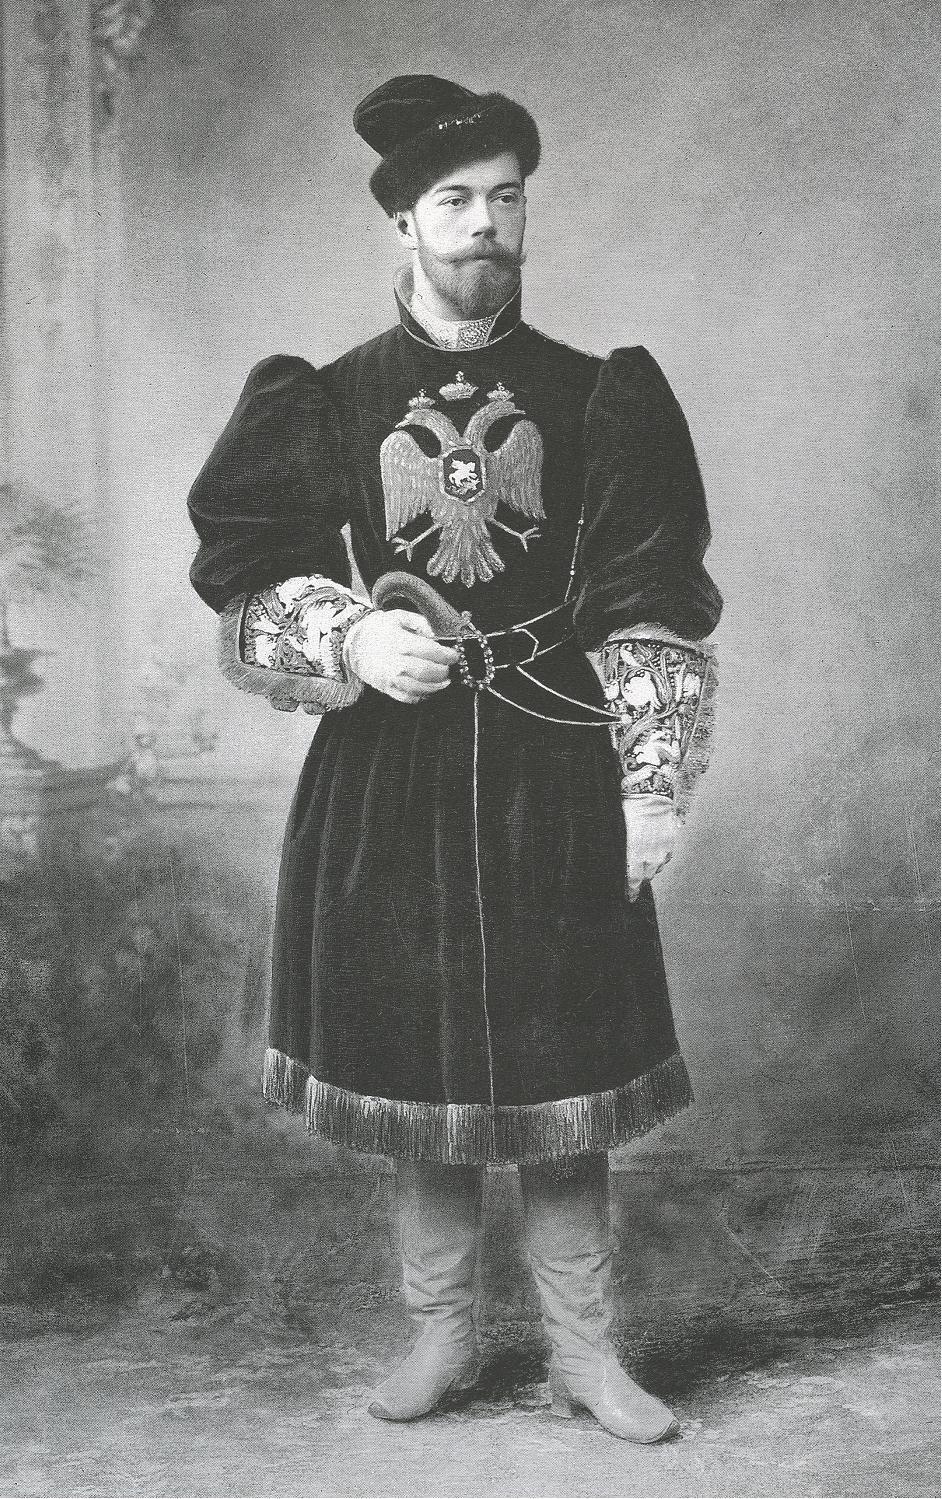 http://ros-lagen.narod.ru/fotoarhiv/Romanov/nicky_2_1903.JPG